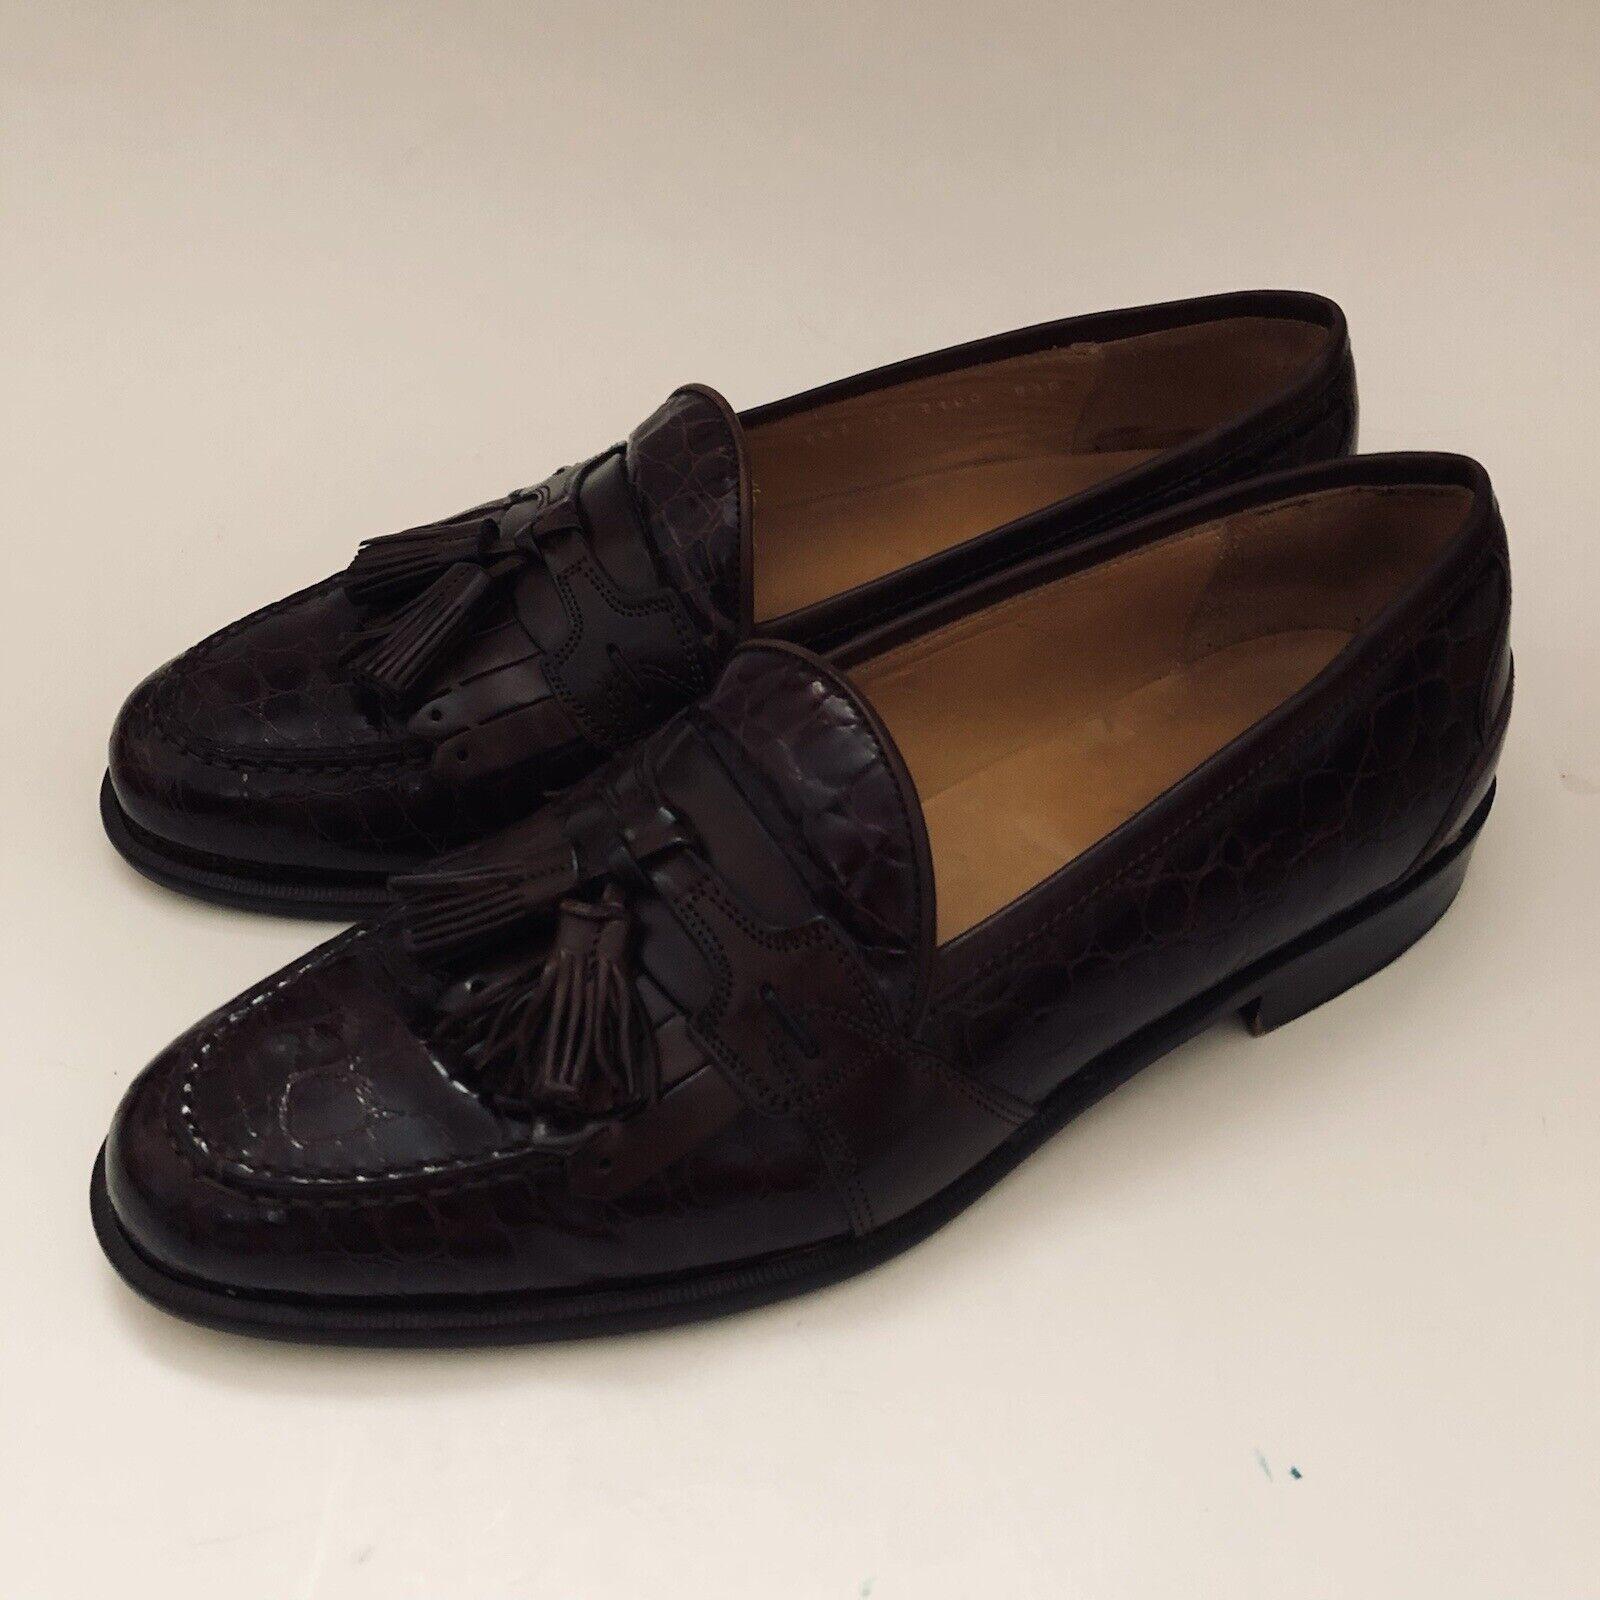 Johnston Murphy Mens Shoes Wingtip Tassel Kiltie Loafers Brown Leather US 8.5 M